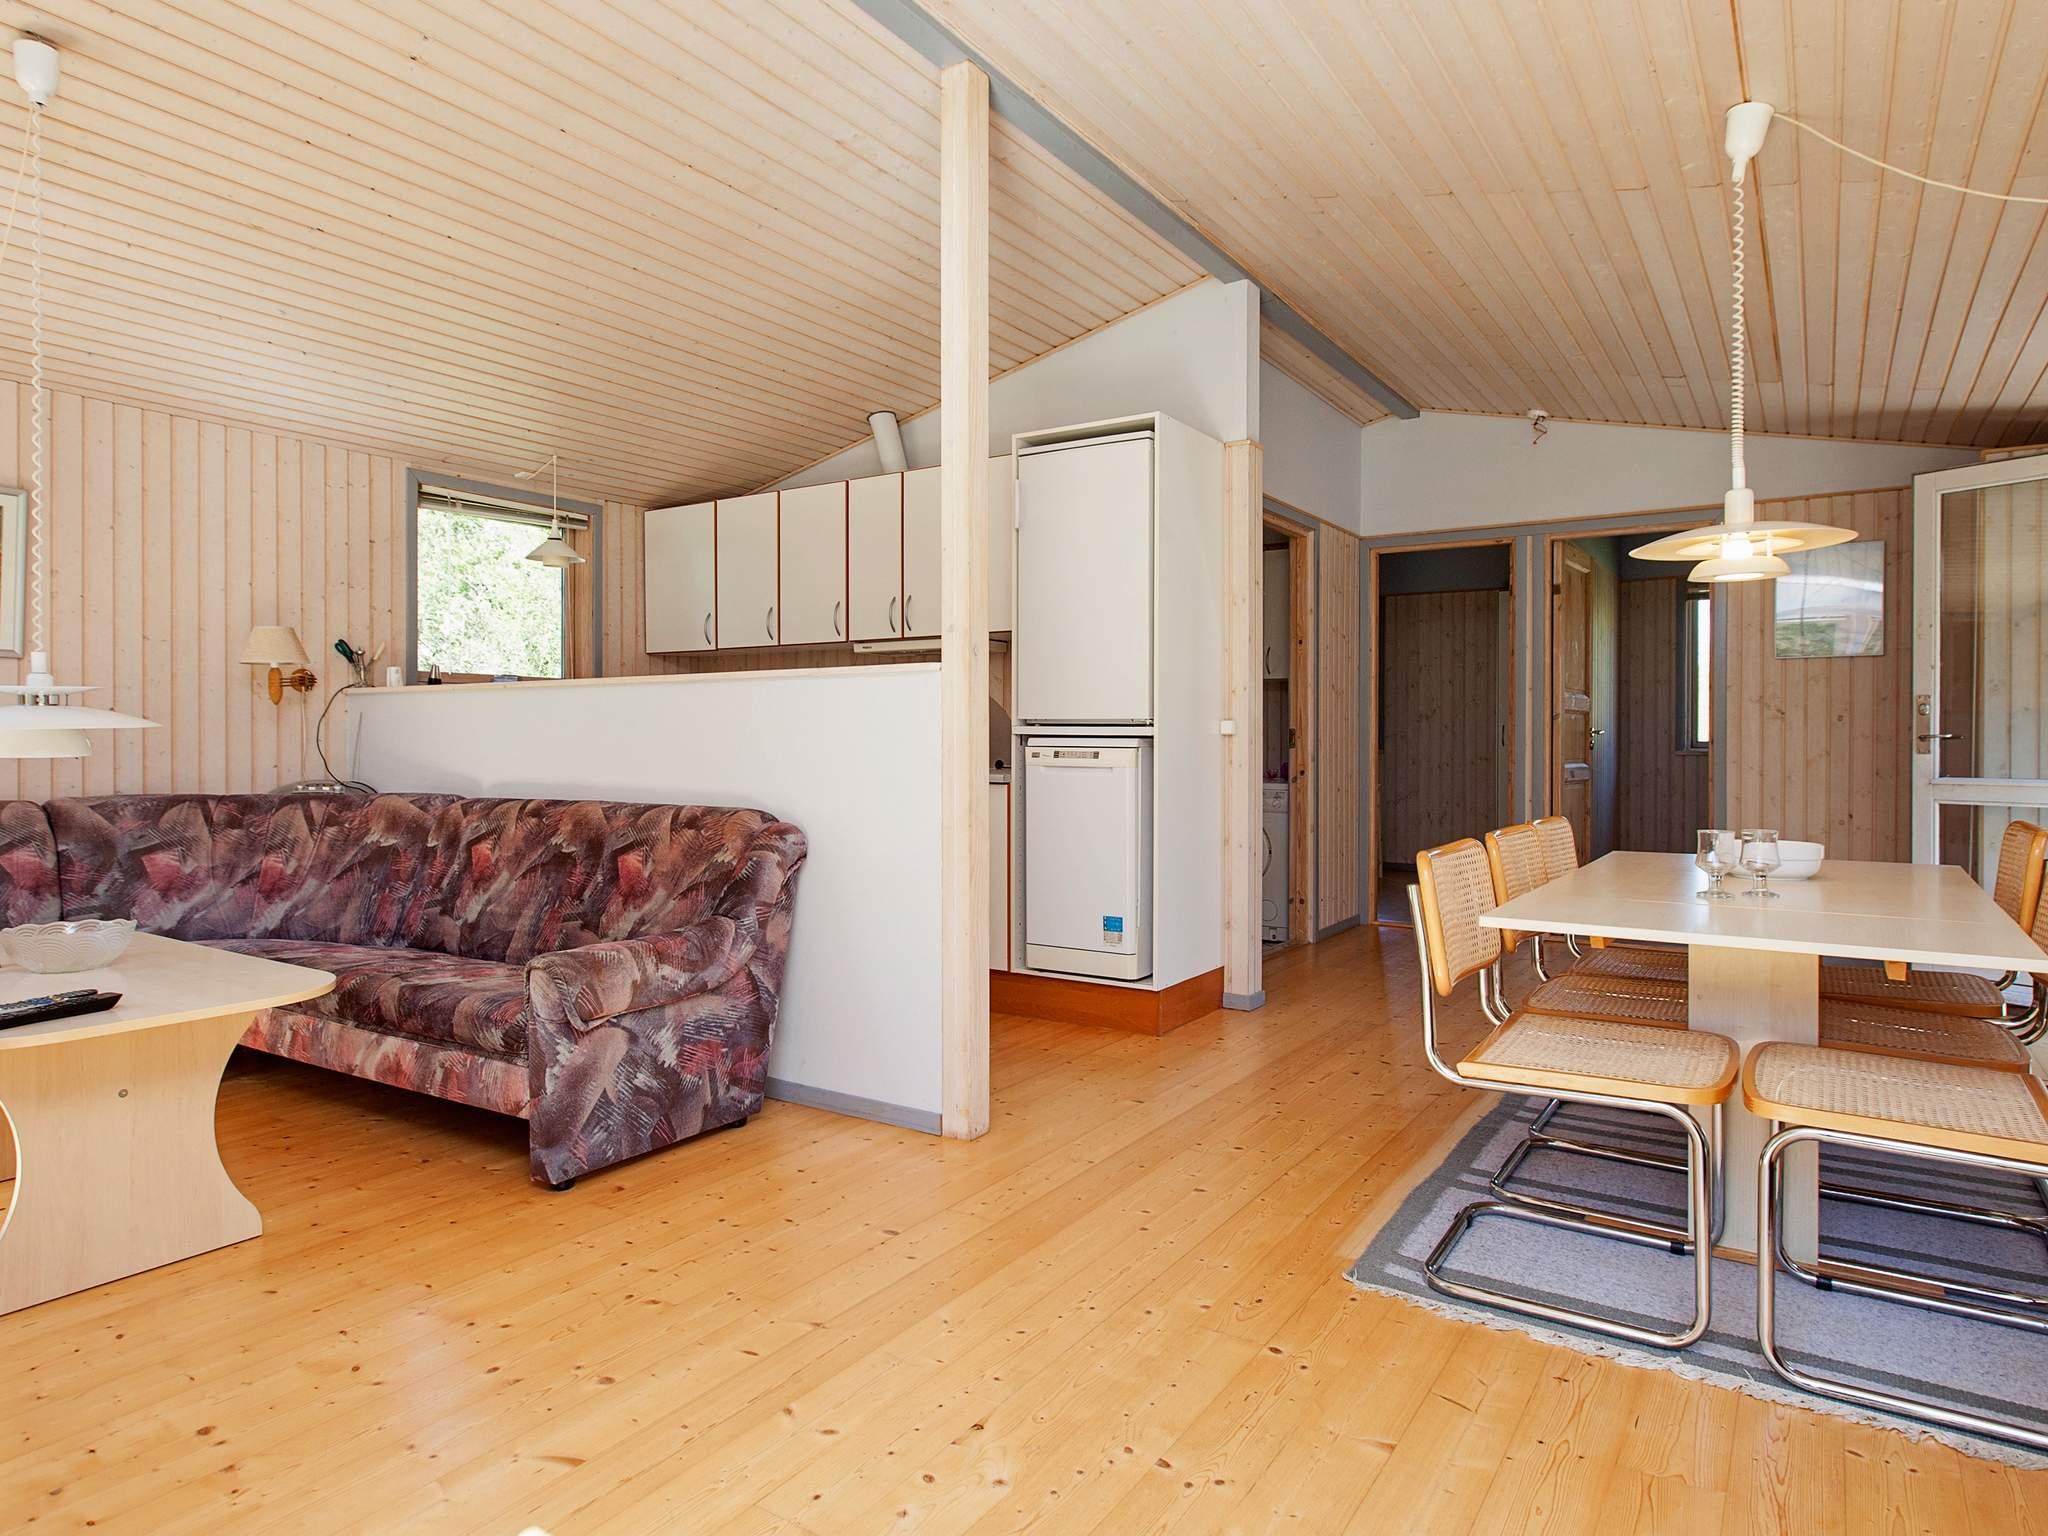 Ferienhaus Overby Lyng (93506), Nykøbing Sj, , Westseeland, Dänemark, Bild 13